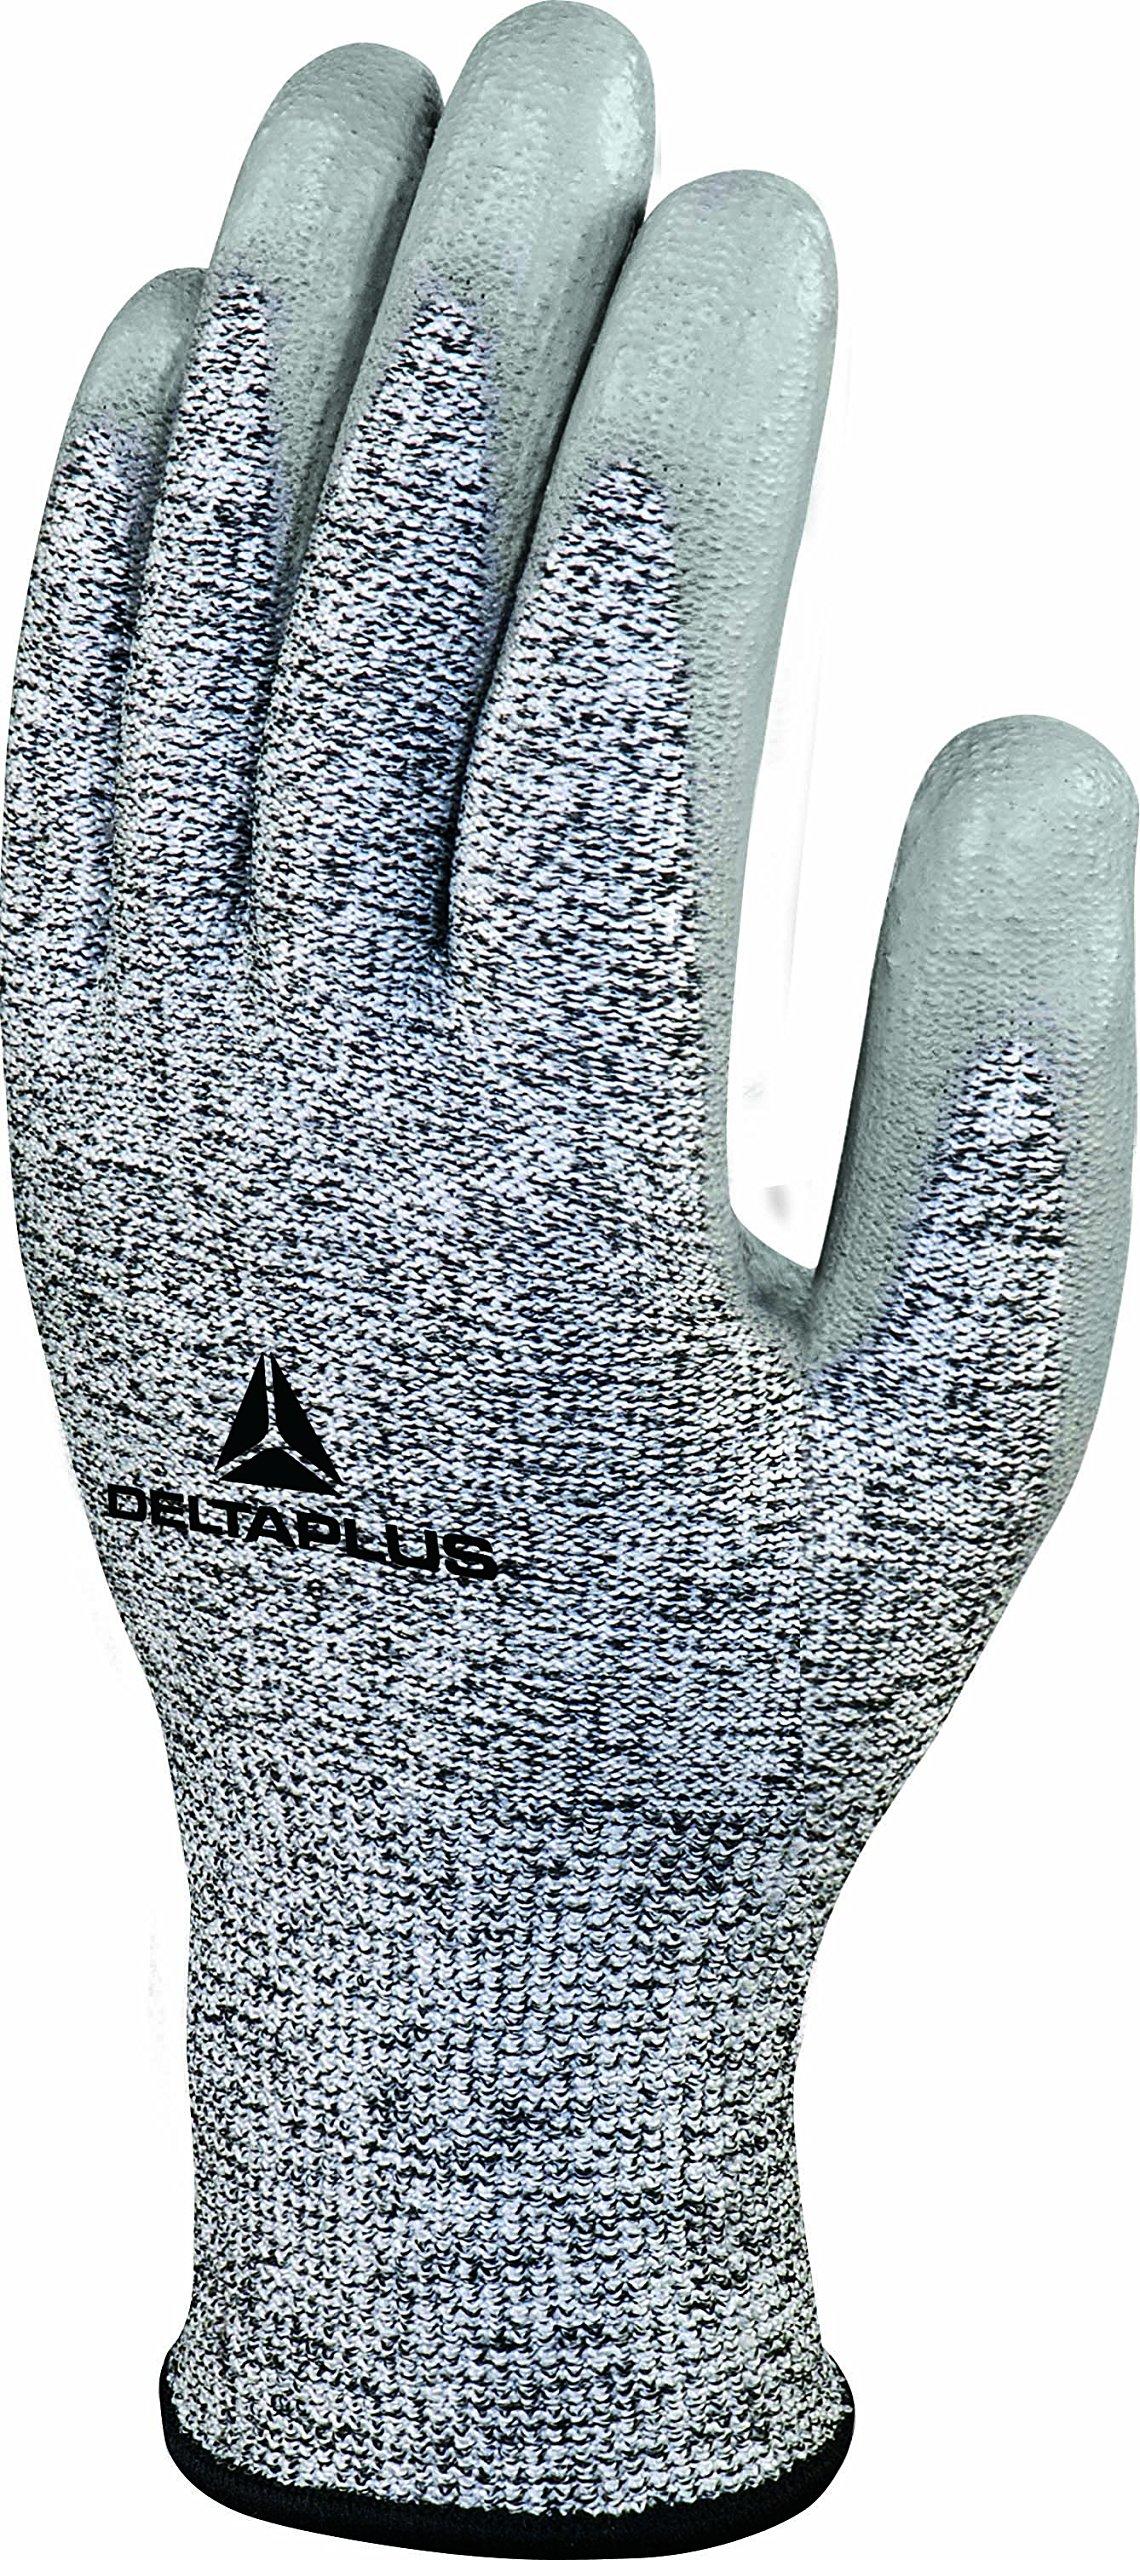 Elvex - VENICUT58G3 High Performance Polyethylene Fiber Cut Resistant Gloves Size 10 by Elvex (Image #1)